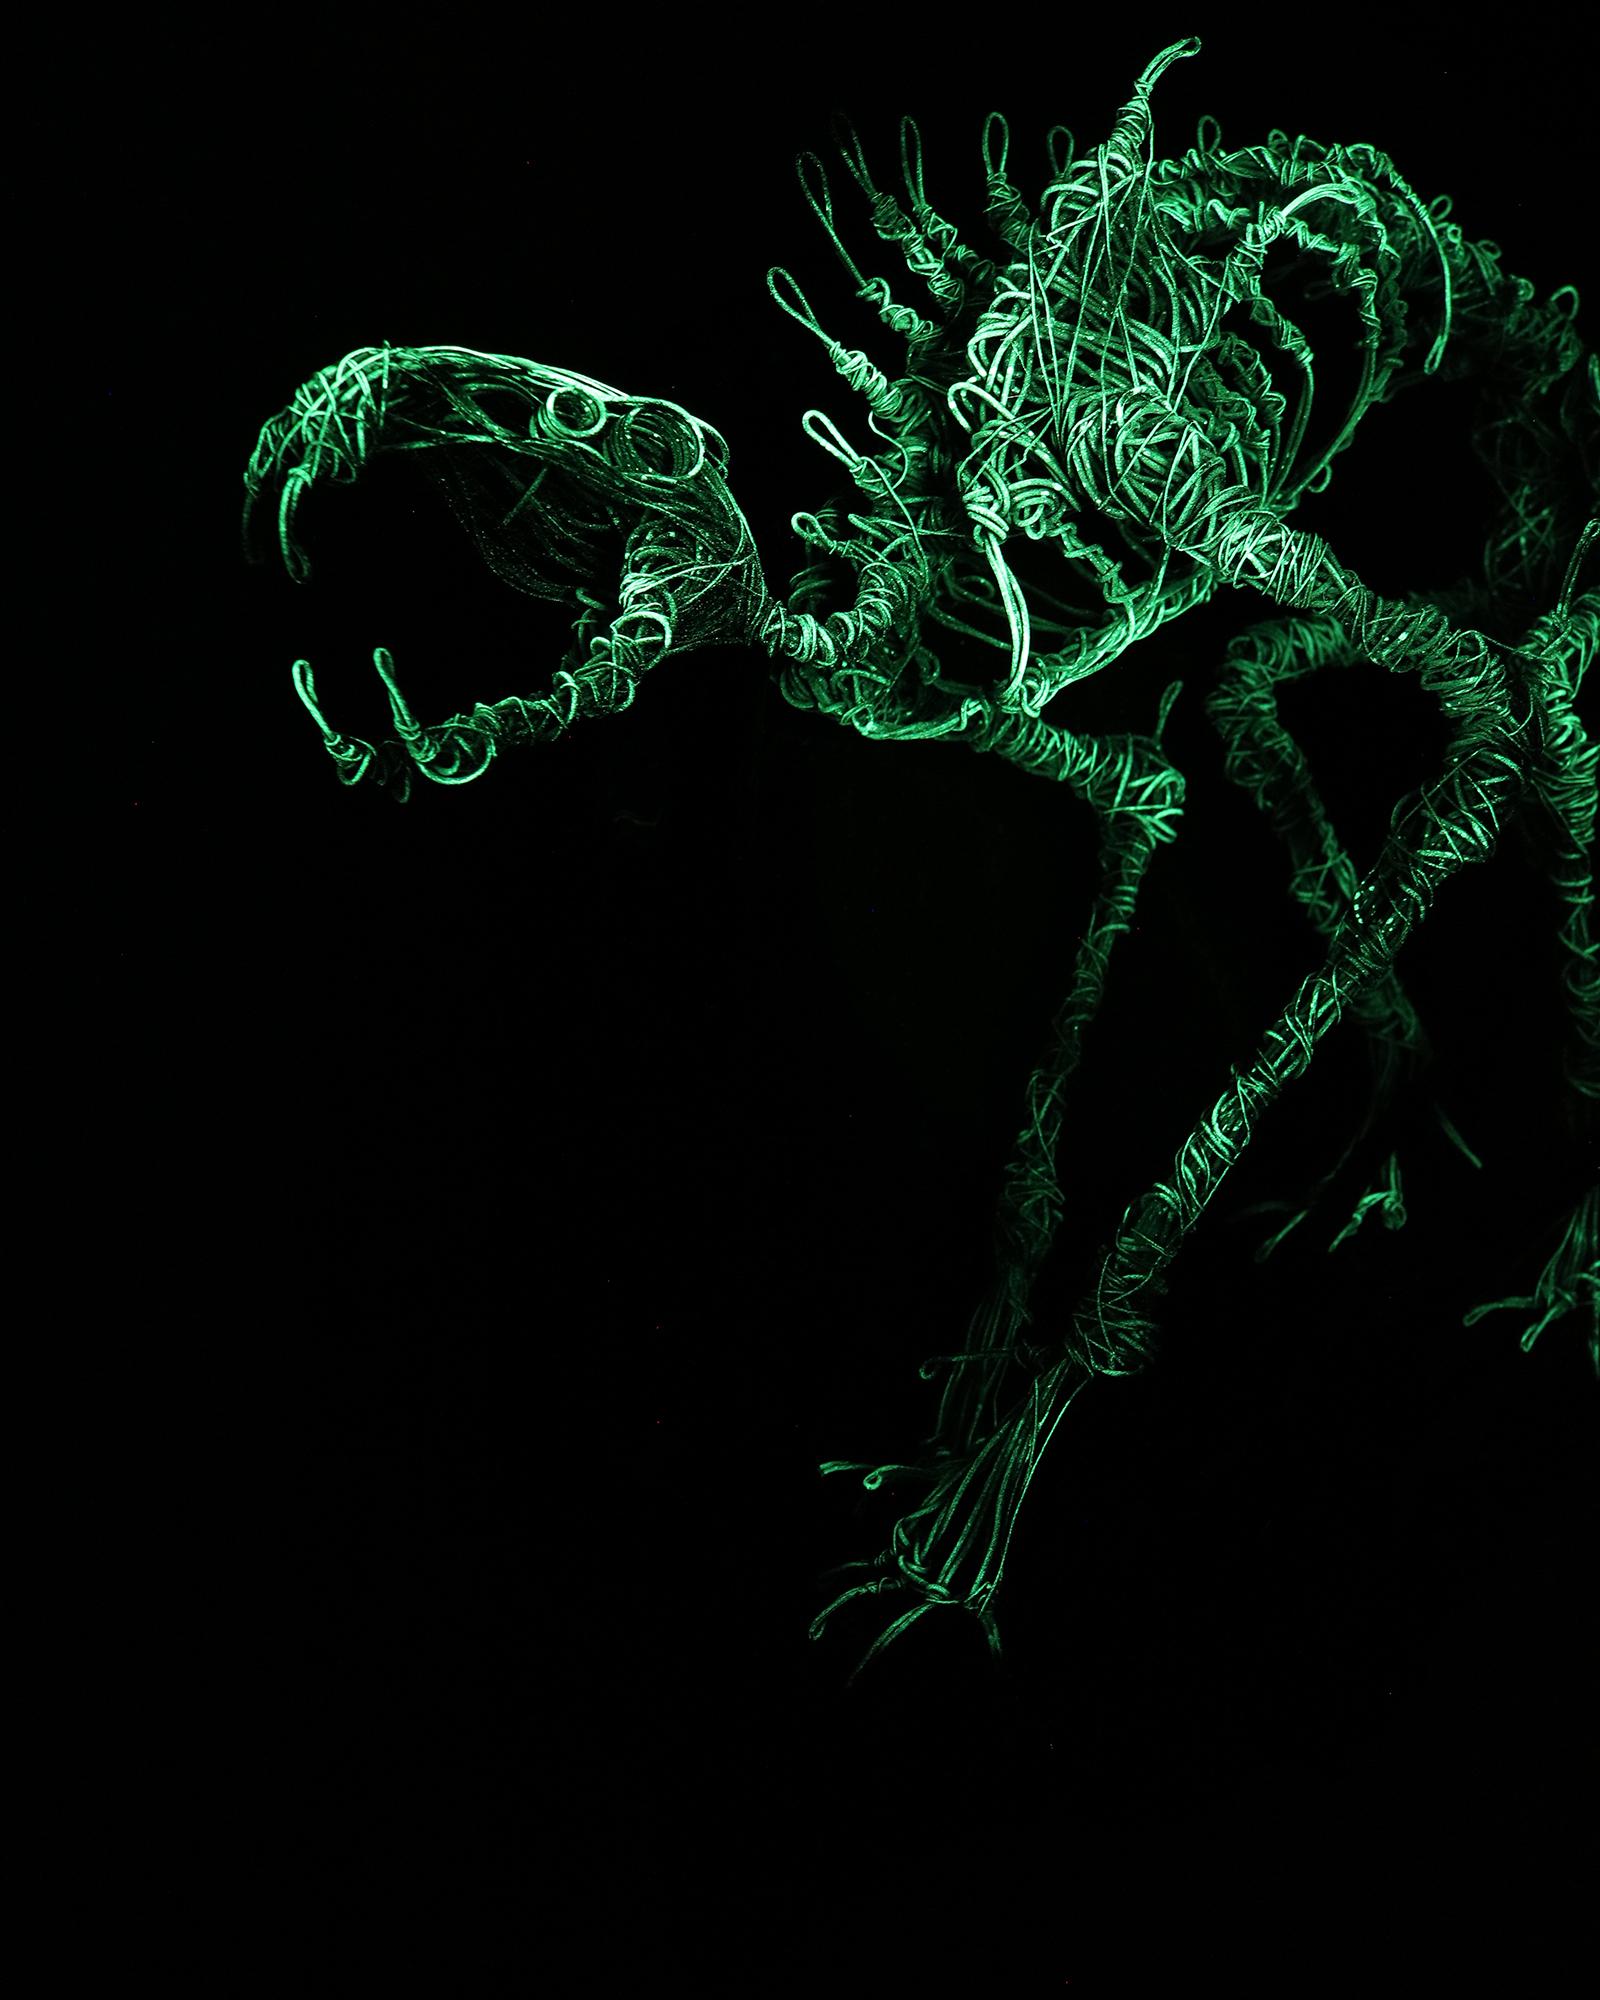 LUNA TIMORE (Glow in the Dark)